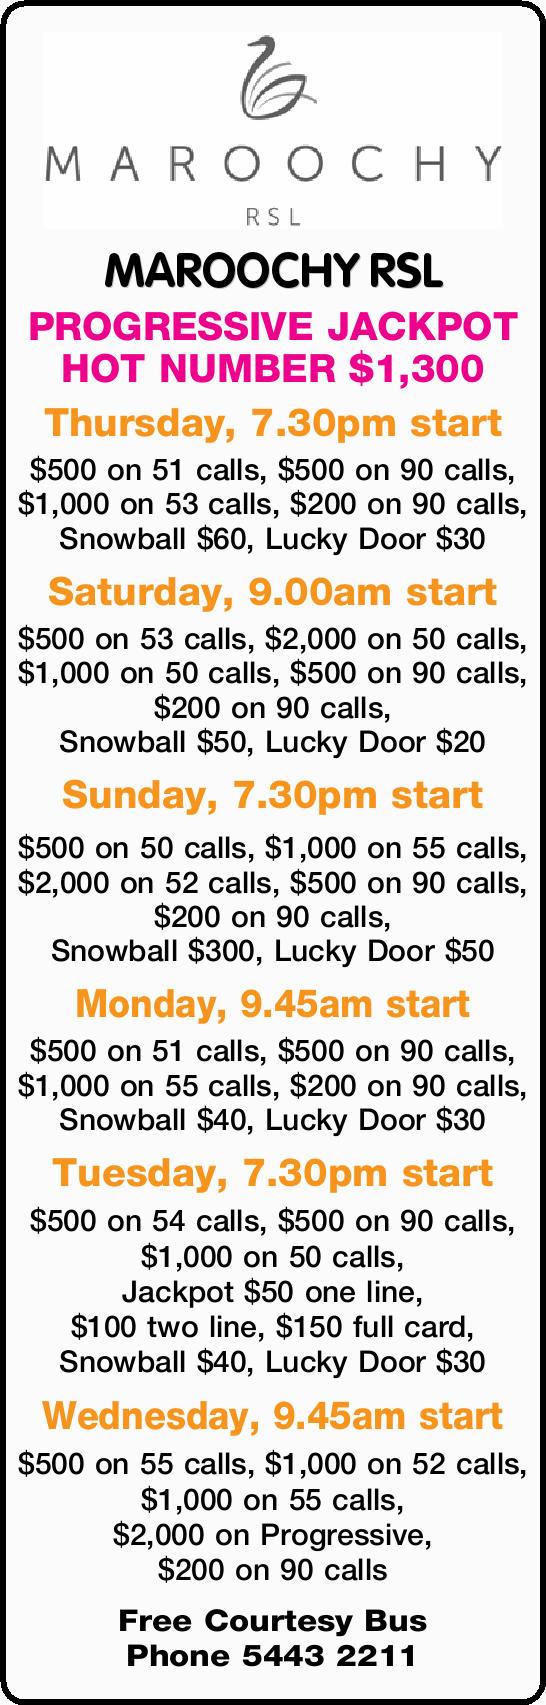 MAROOCHY RSL PROGRESSIVE JACKPOT HOT NUMBER $1,300 Thursday, 7.30pm start $500 on 51 calls, $500...